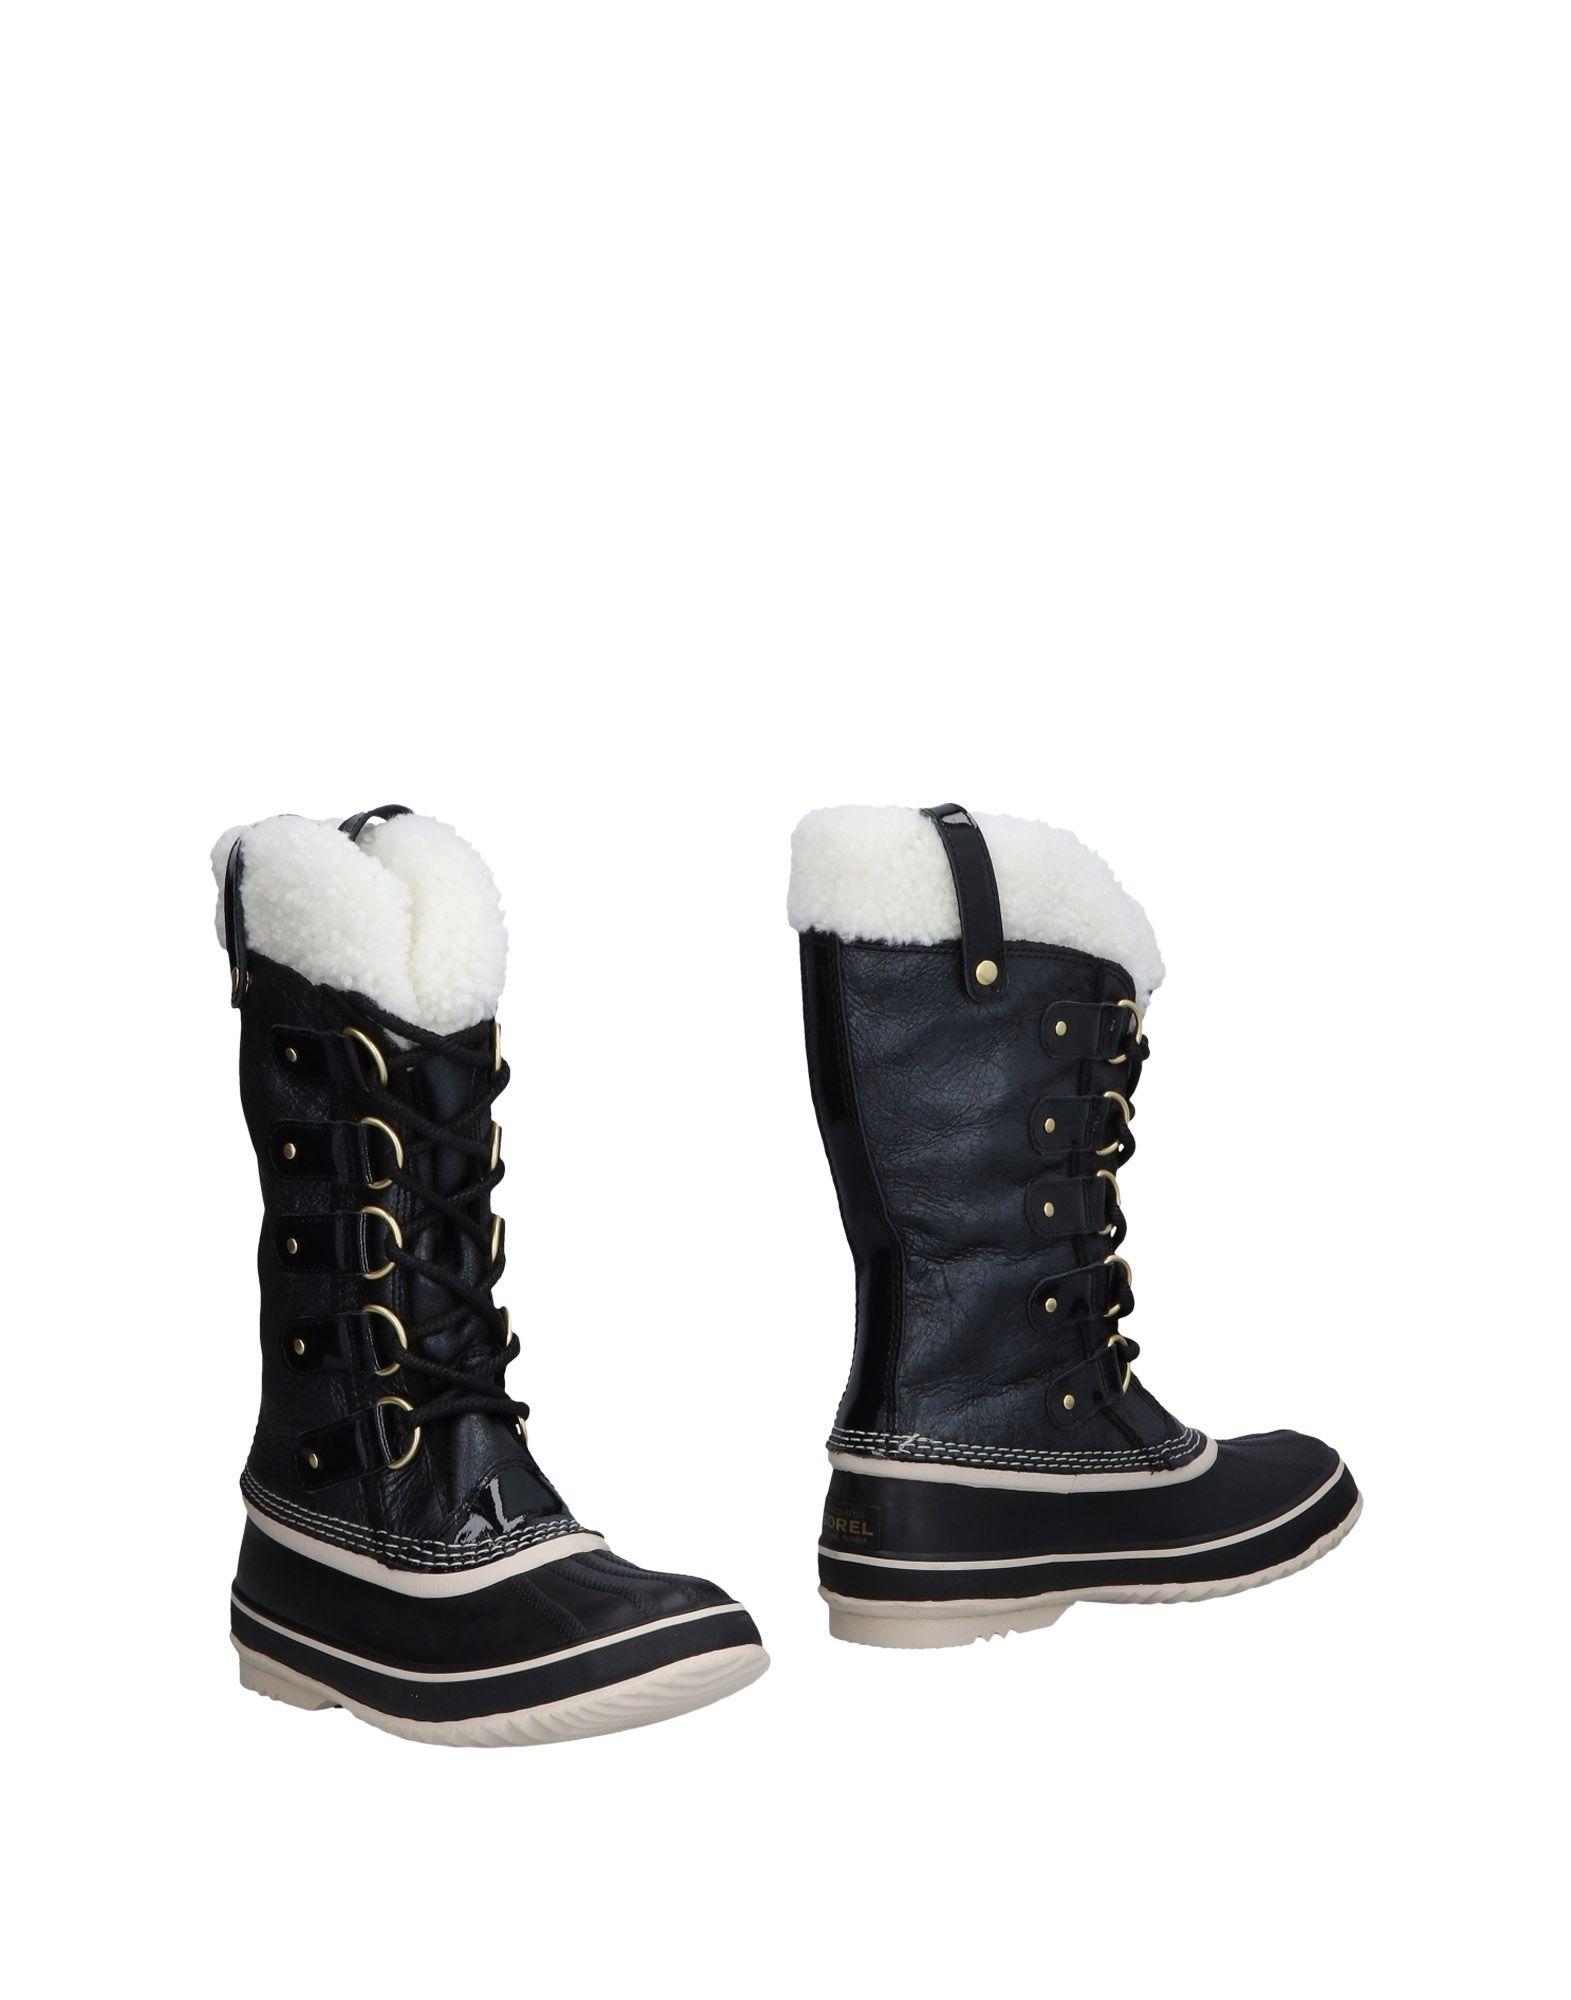 Moda Stivali Sorel Donna - 11474976LX